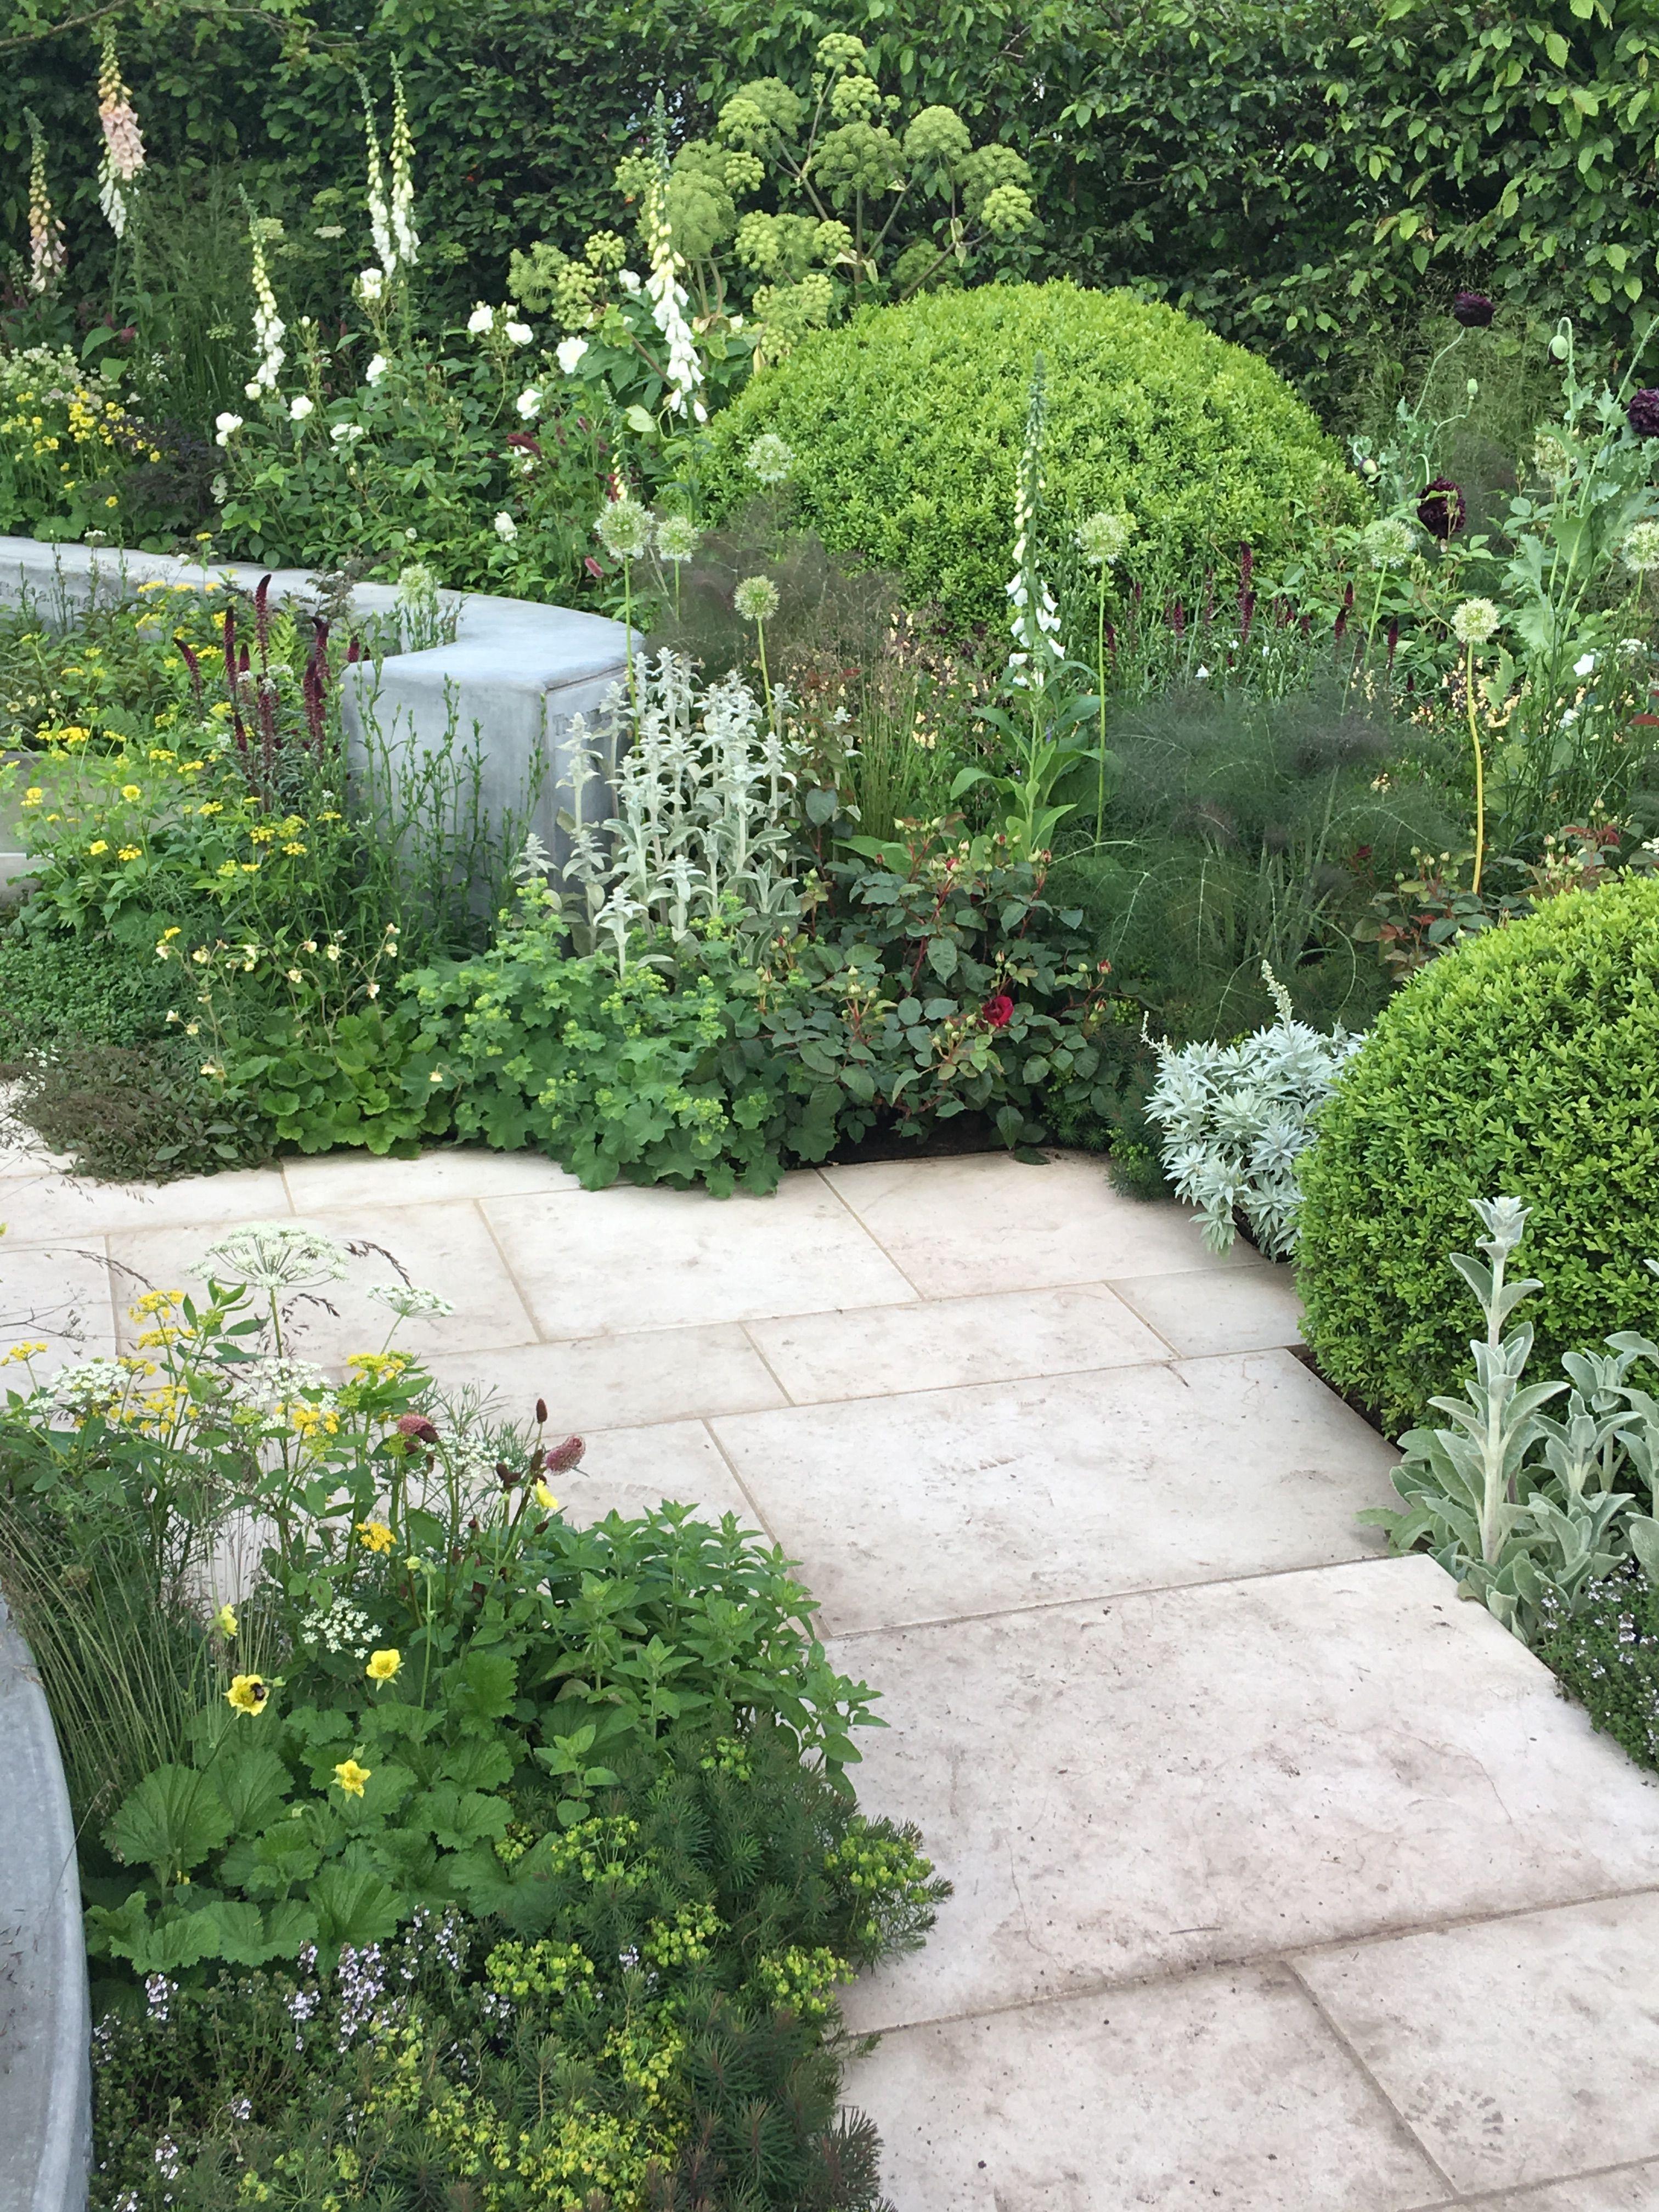 Radio 2 Feel Good Gardens Jo Whiley #Goodgardens